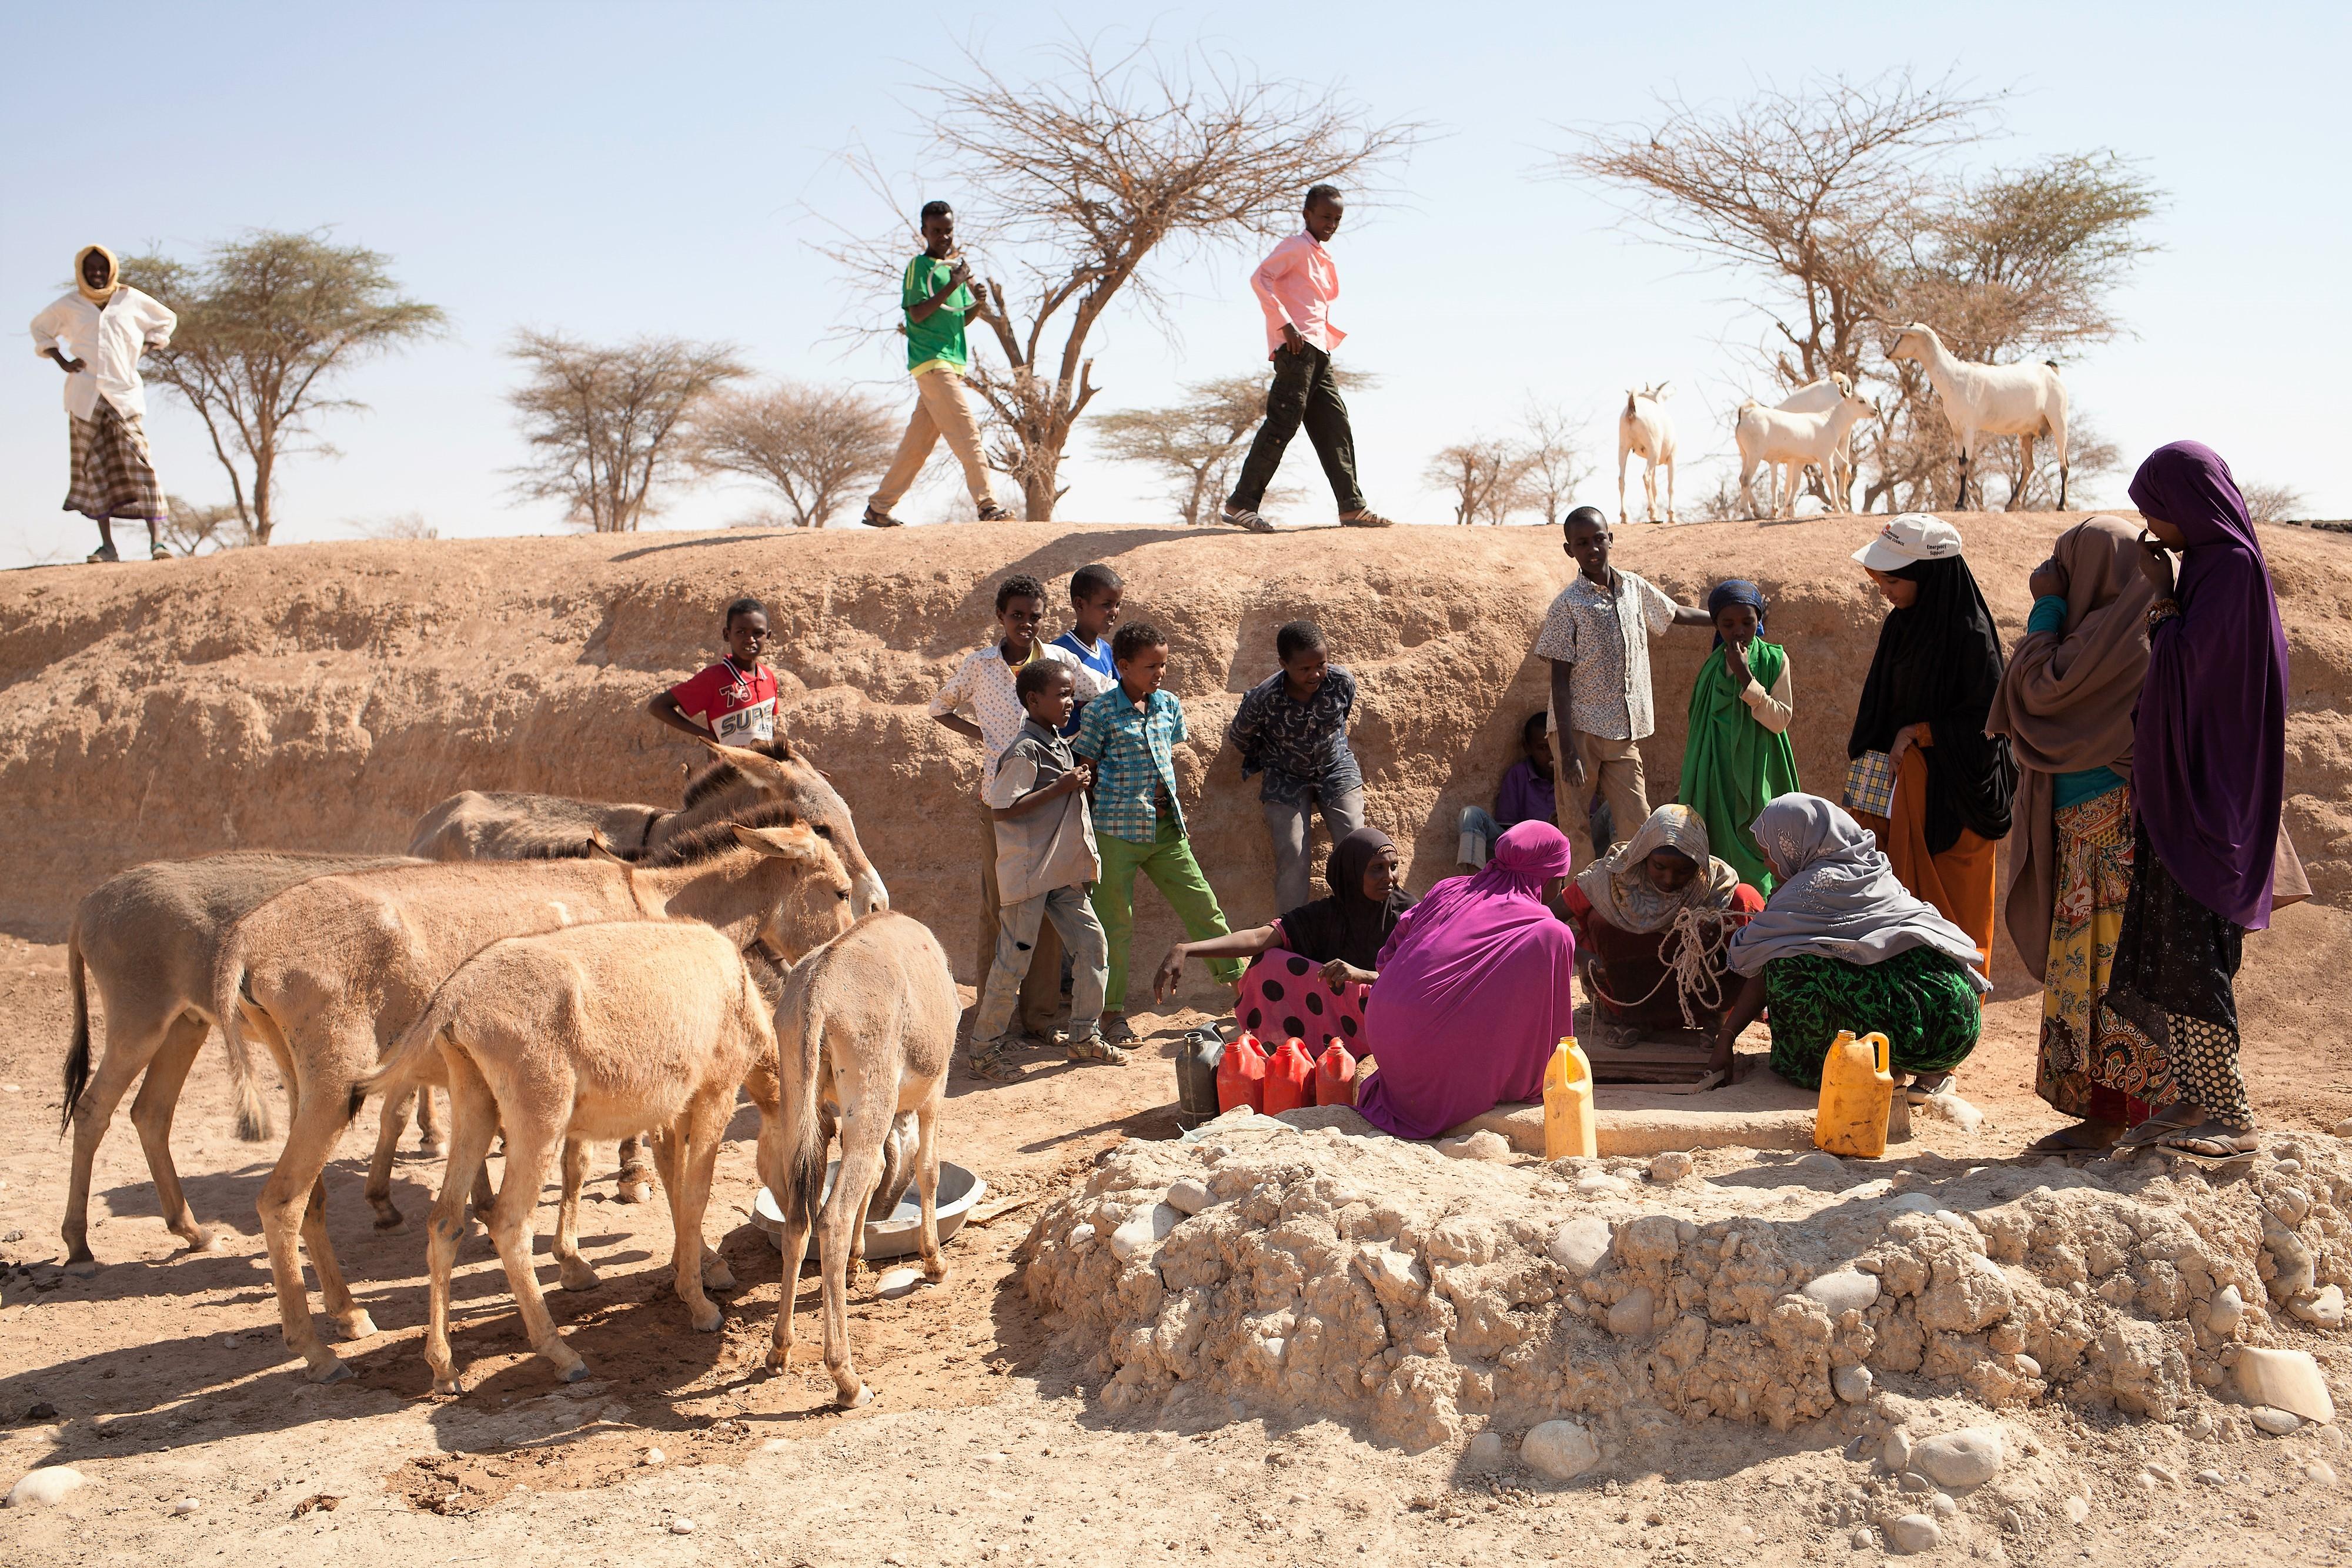 Emergencia en Somalia